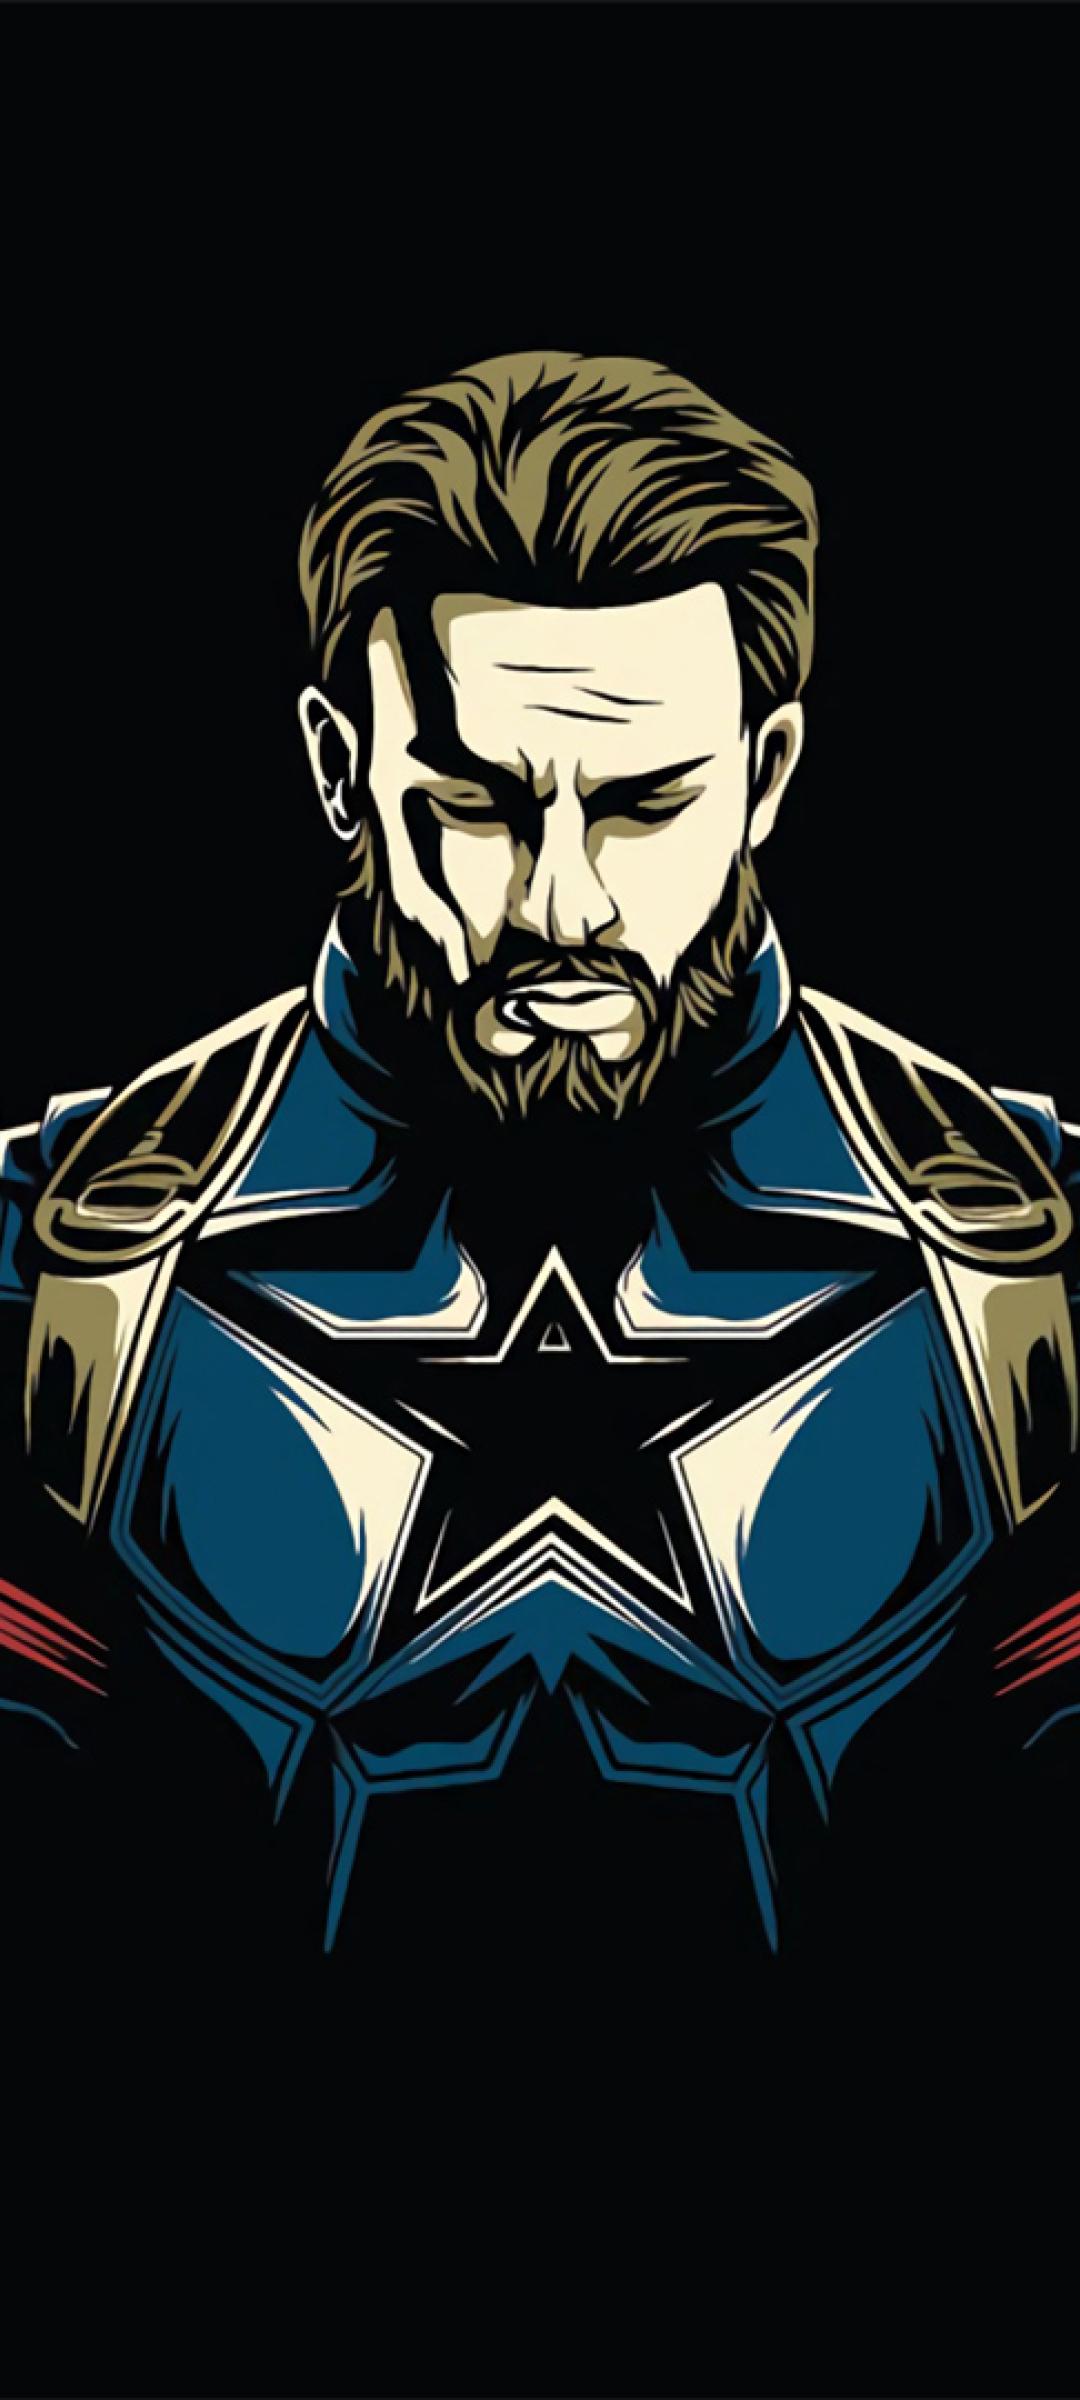 1080x2400 Captain America Minimalist Design 1080x2400 ...